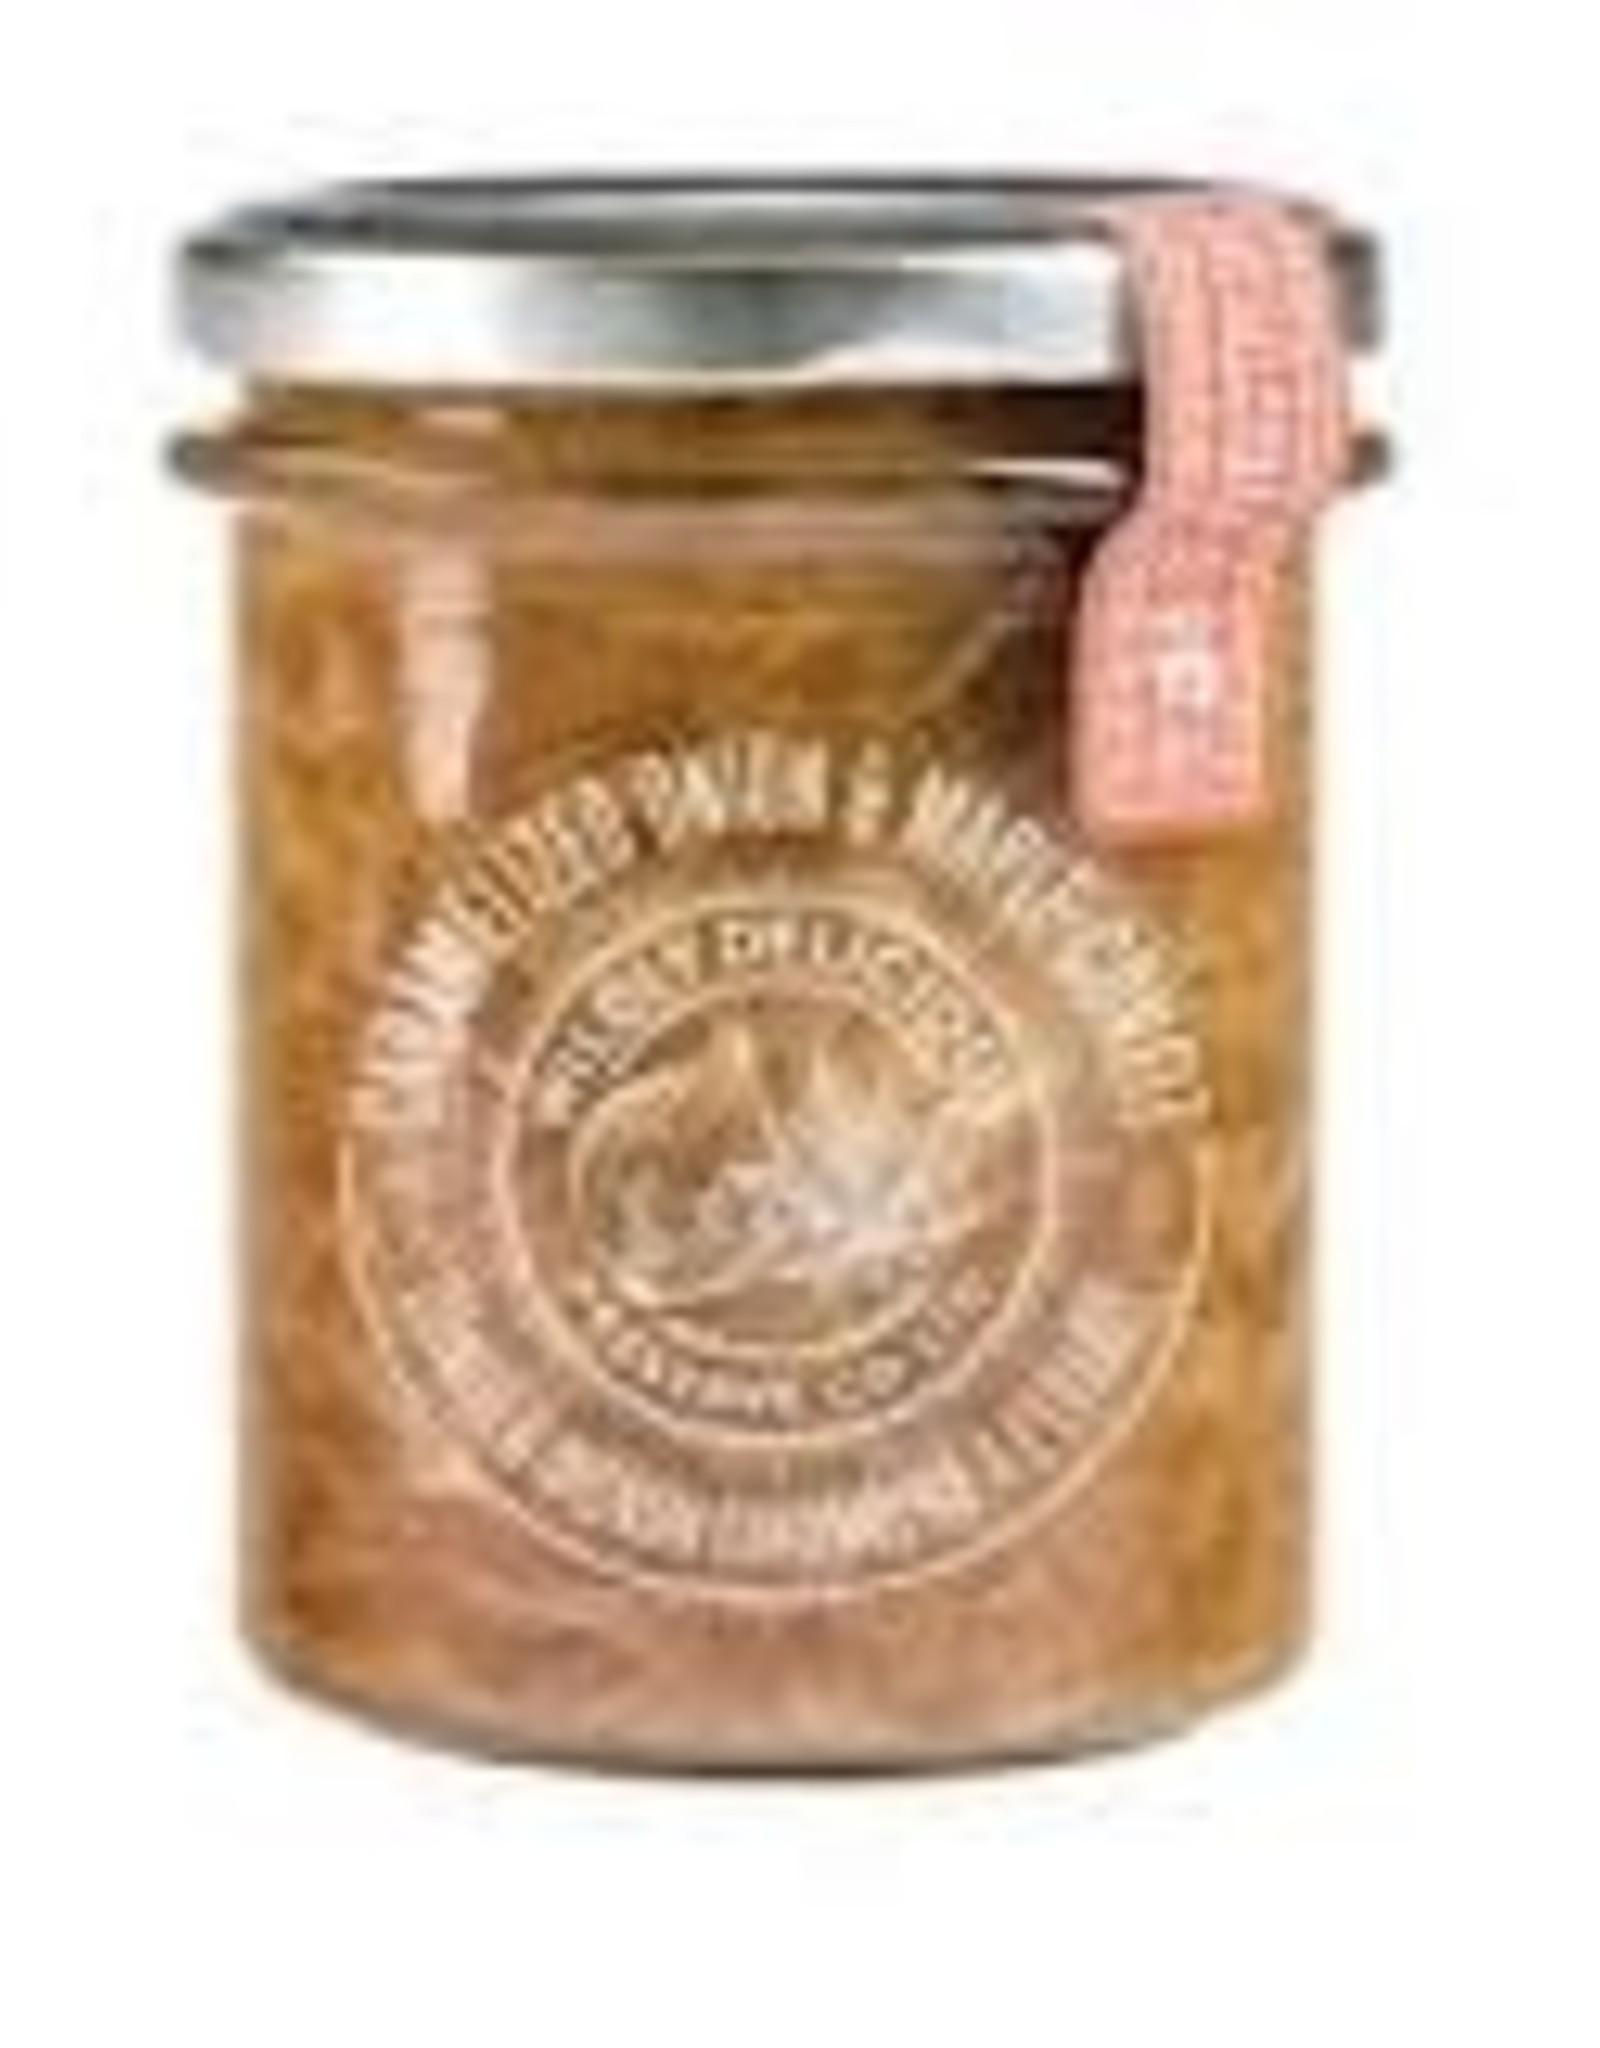 Wildly Delicious Carmelized Onion & Maple Confit